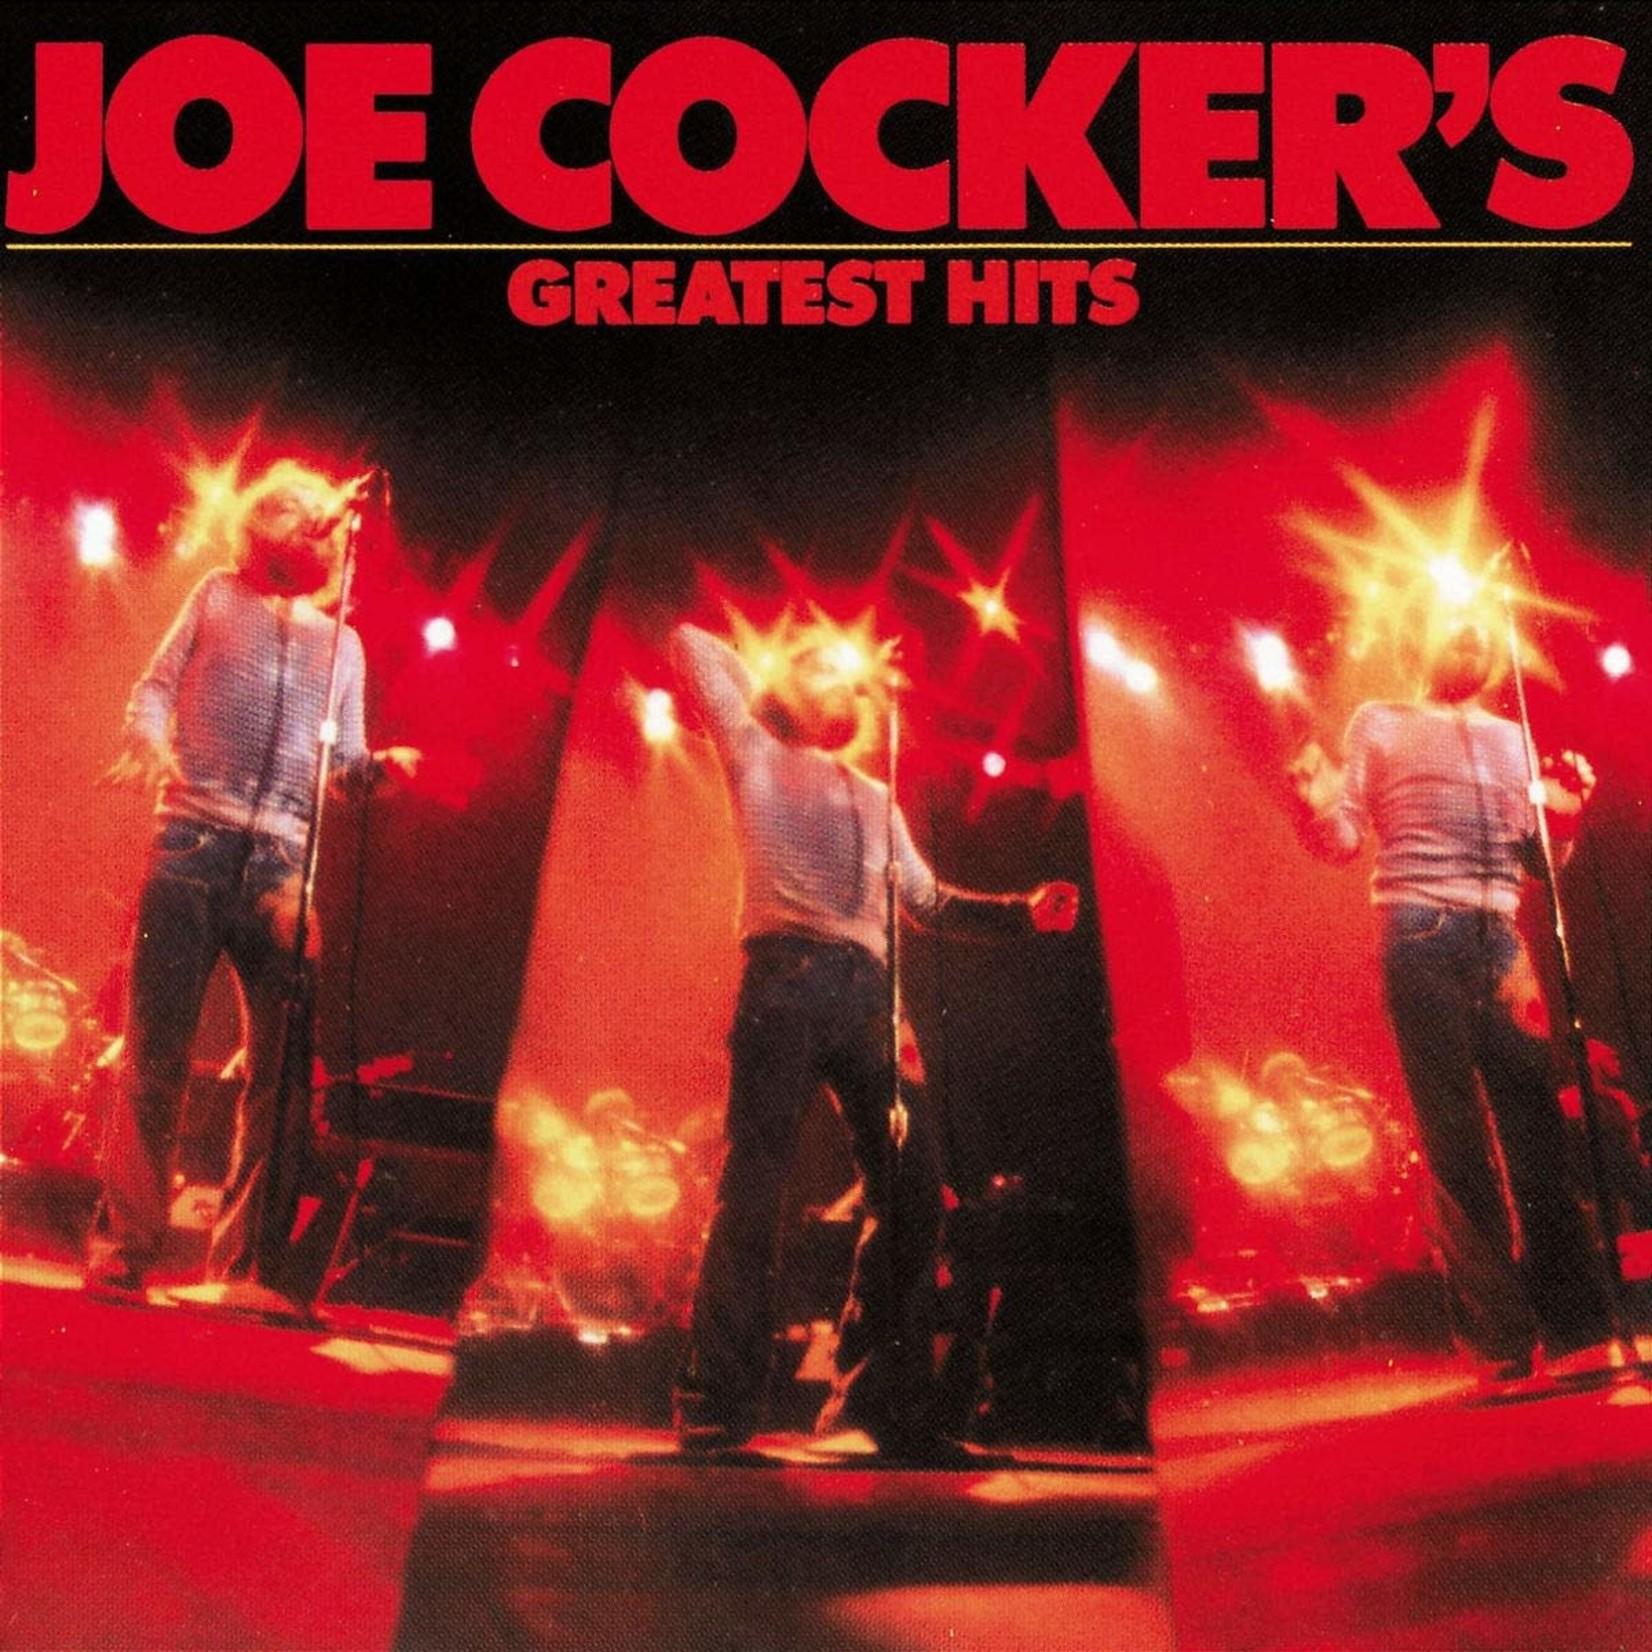 [Vintage] Cocker, Joe: Greatest Hits